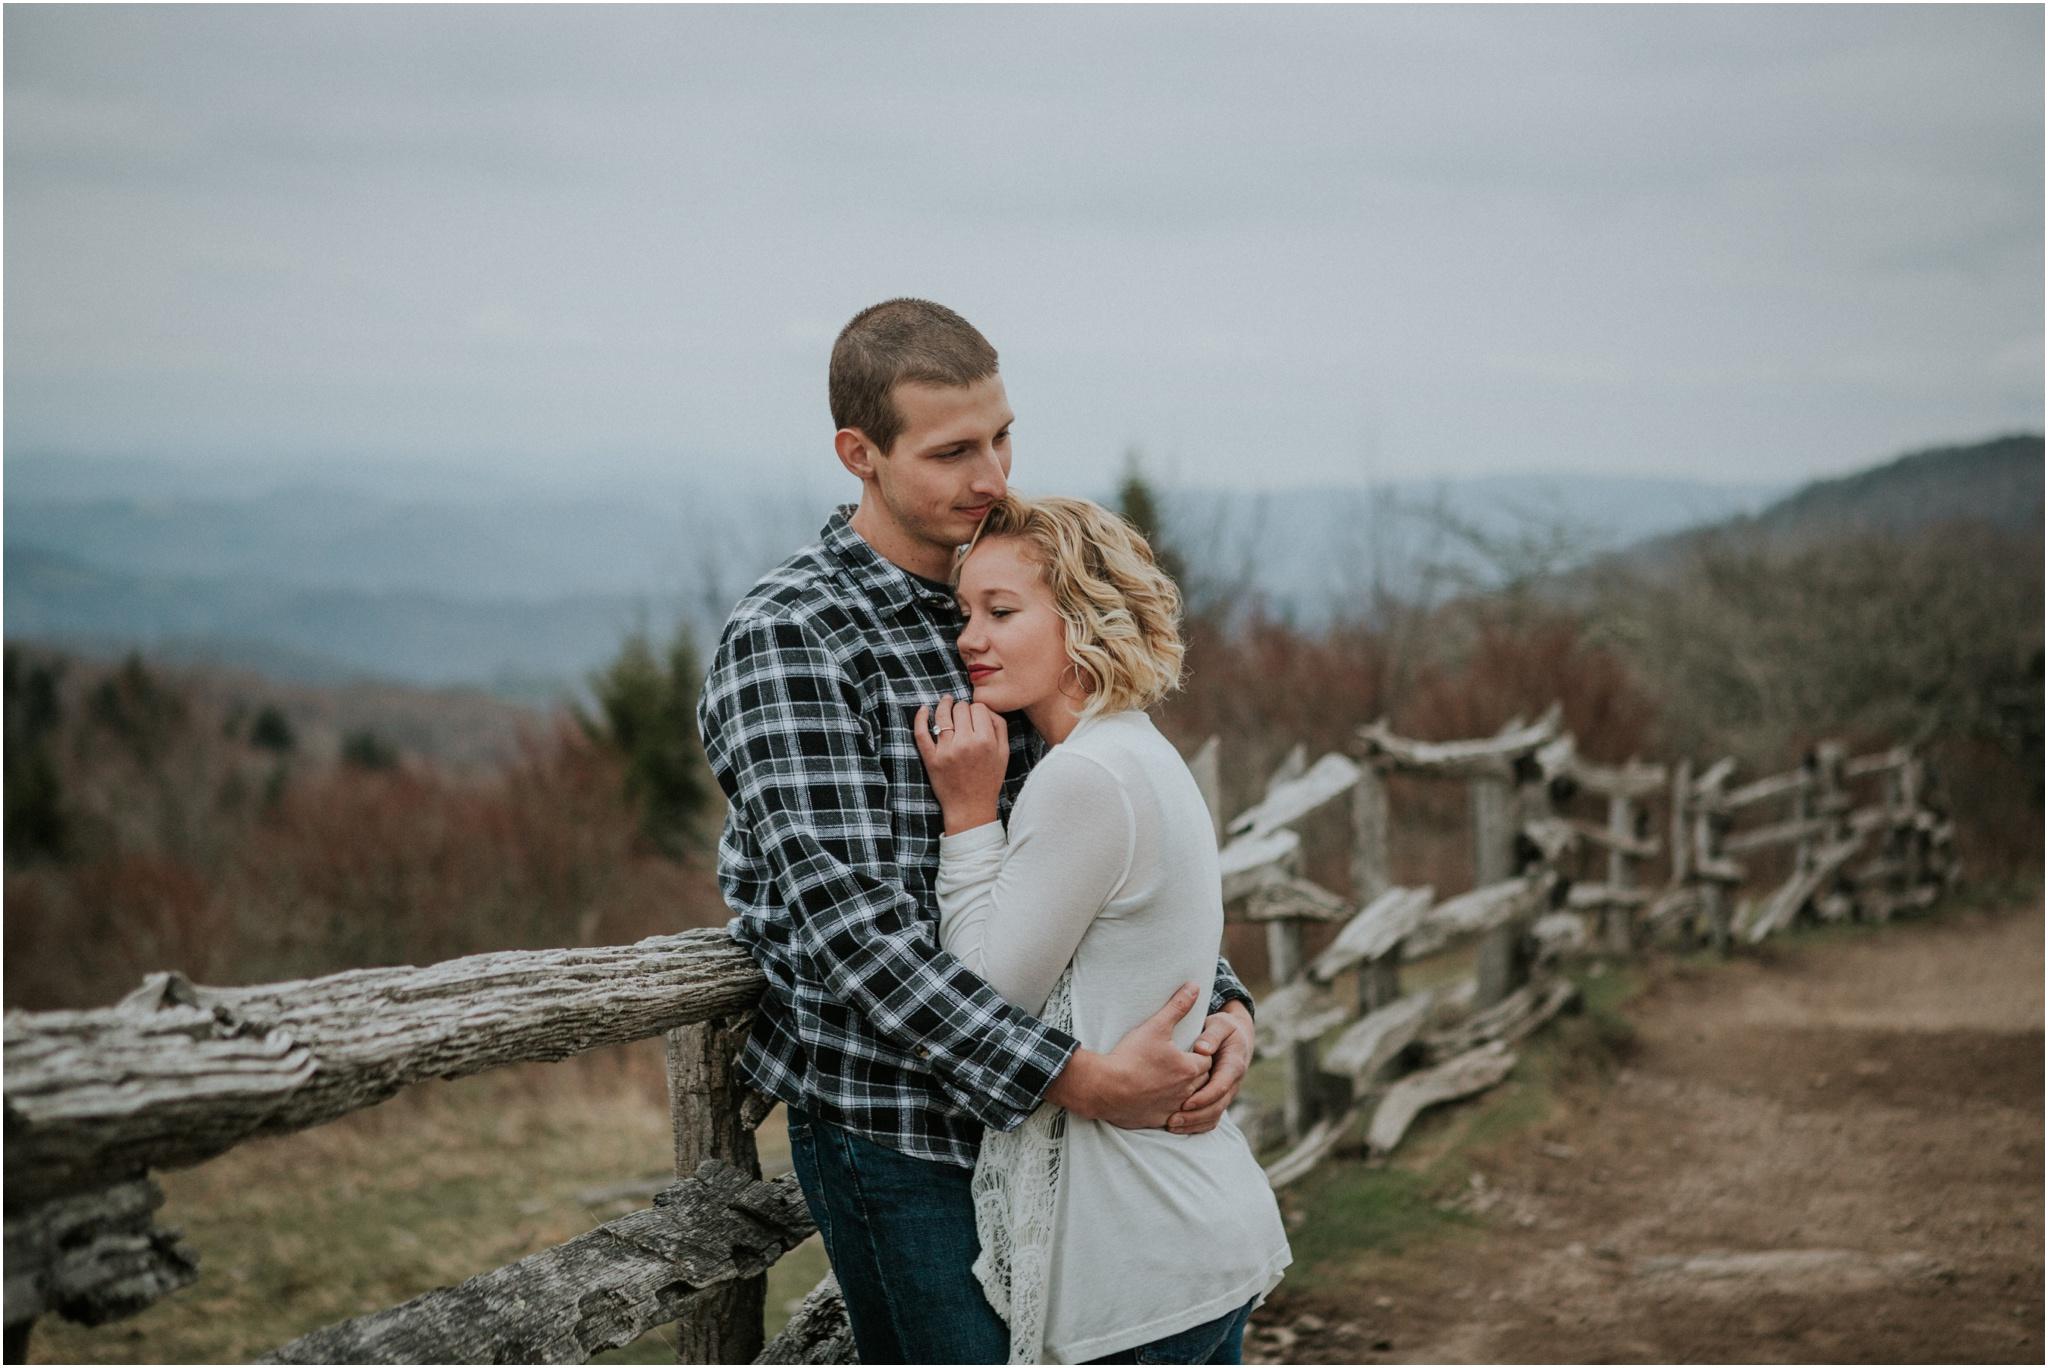 grayson-highlands-engagement-session-foggy-mountain-rustic-appalachian-virginia-katy-sergent-photography_0005.jpg